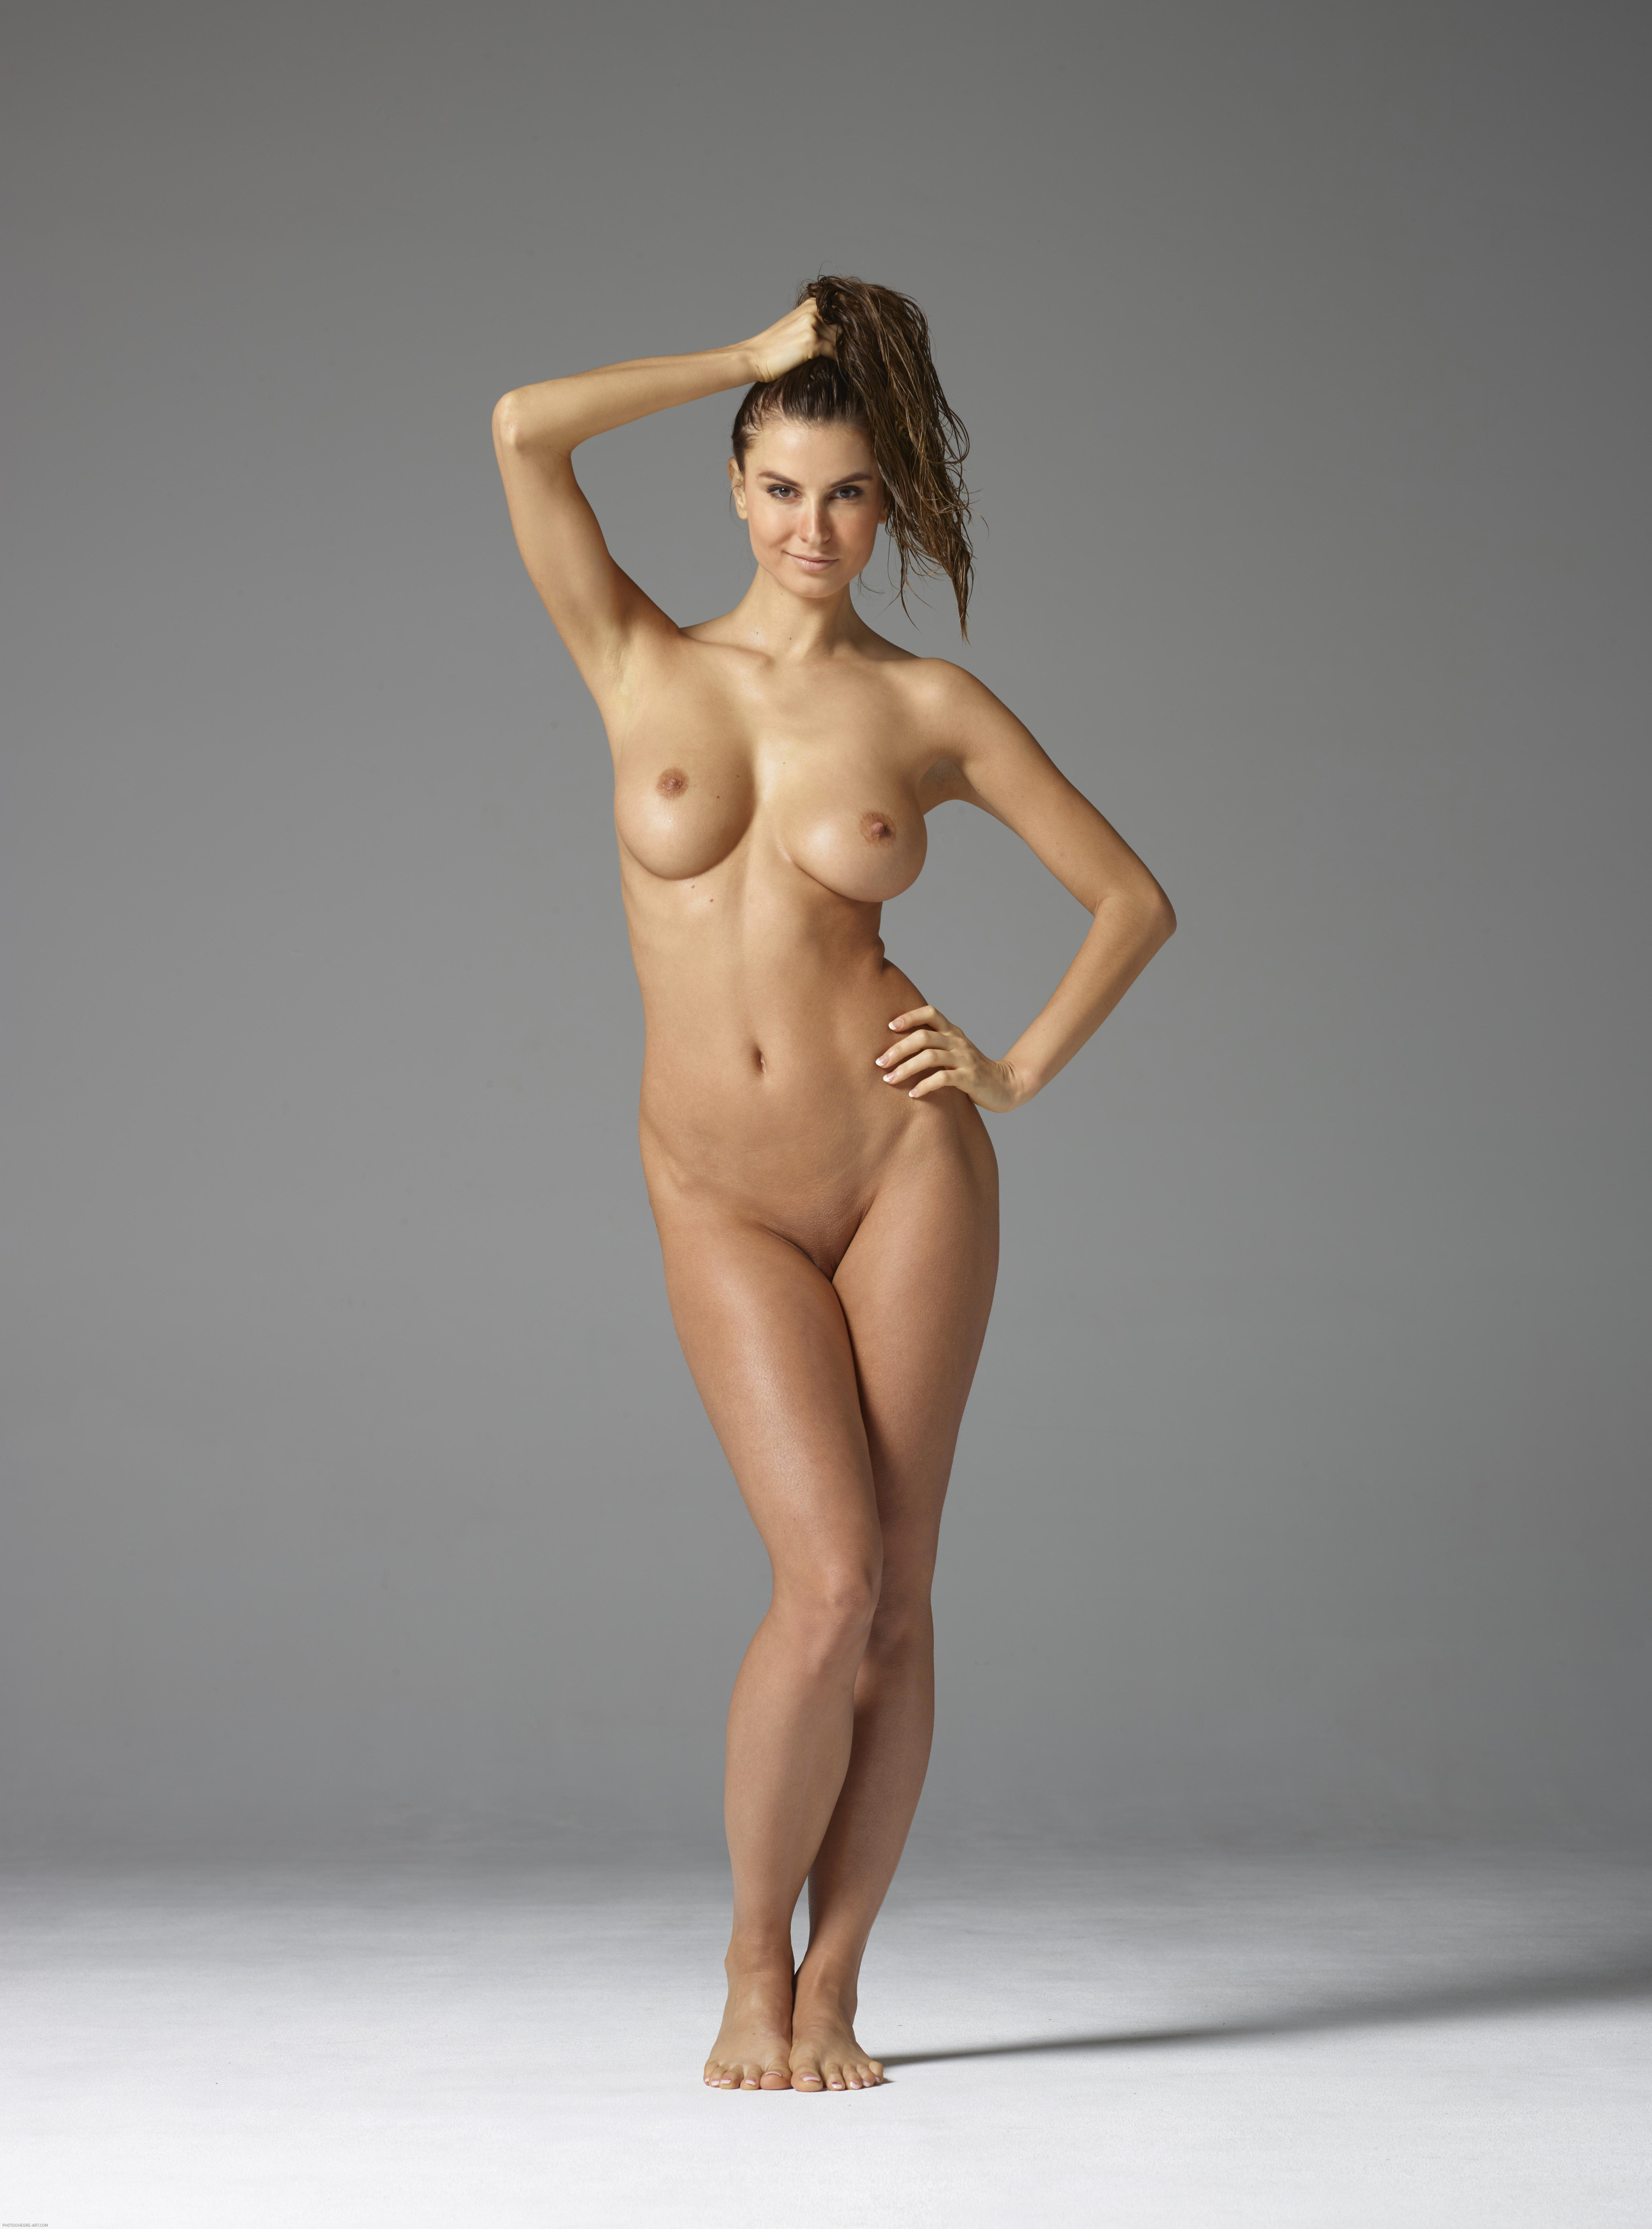 Порно аккуратные фигуры — photo 2